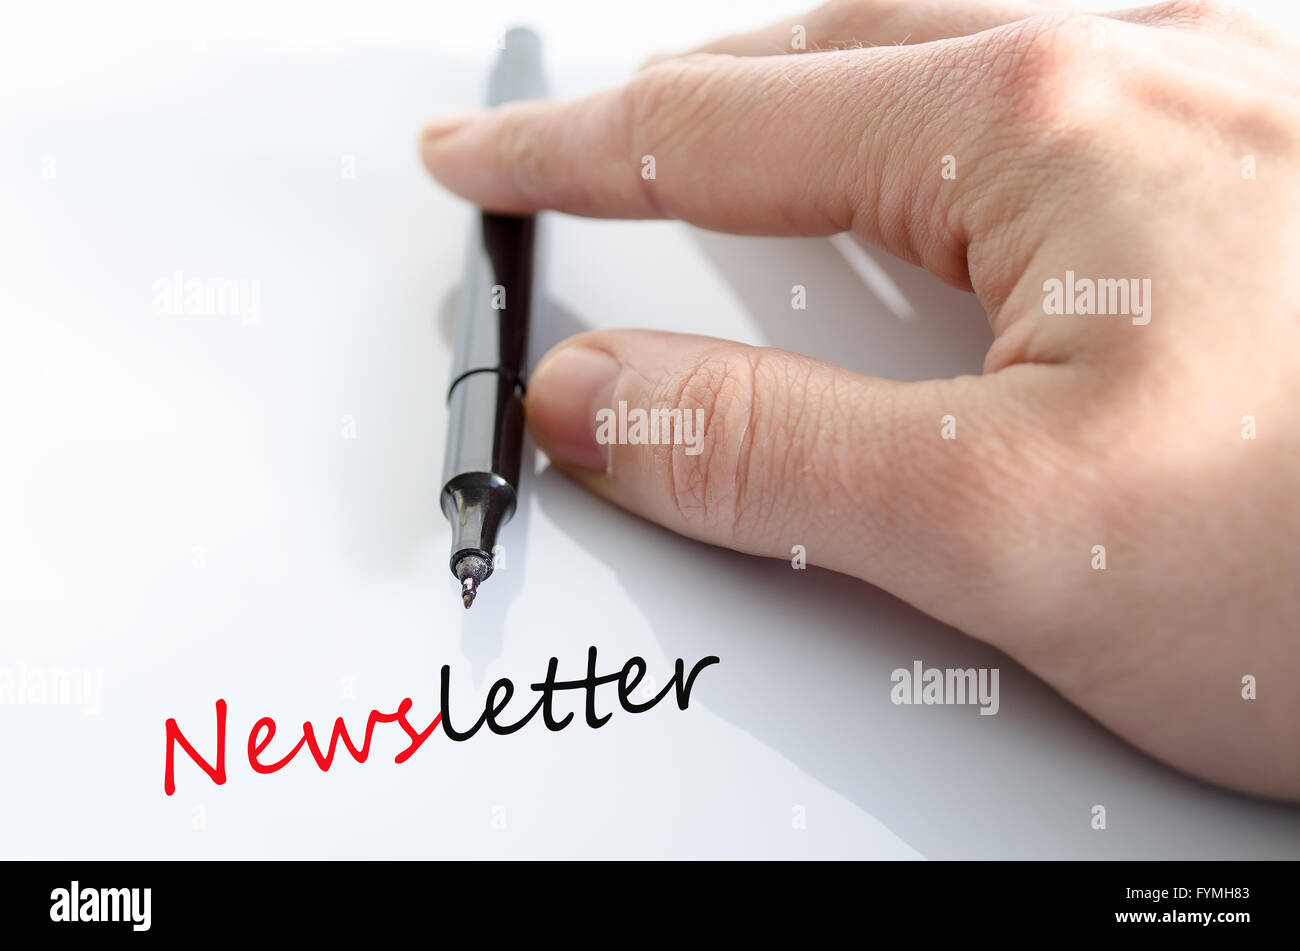 Newsletter concept Stock Photo